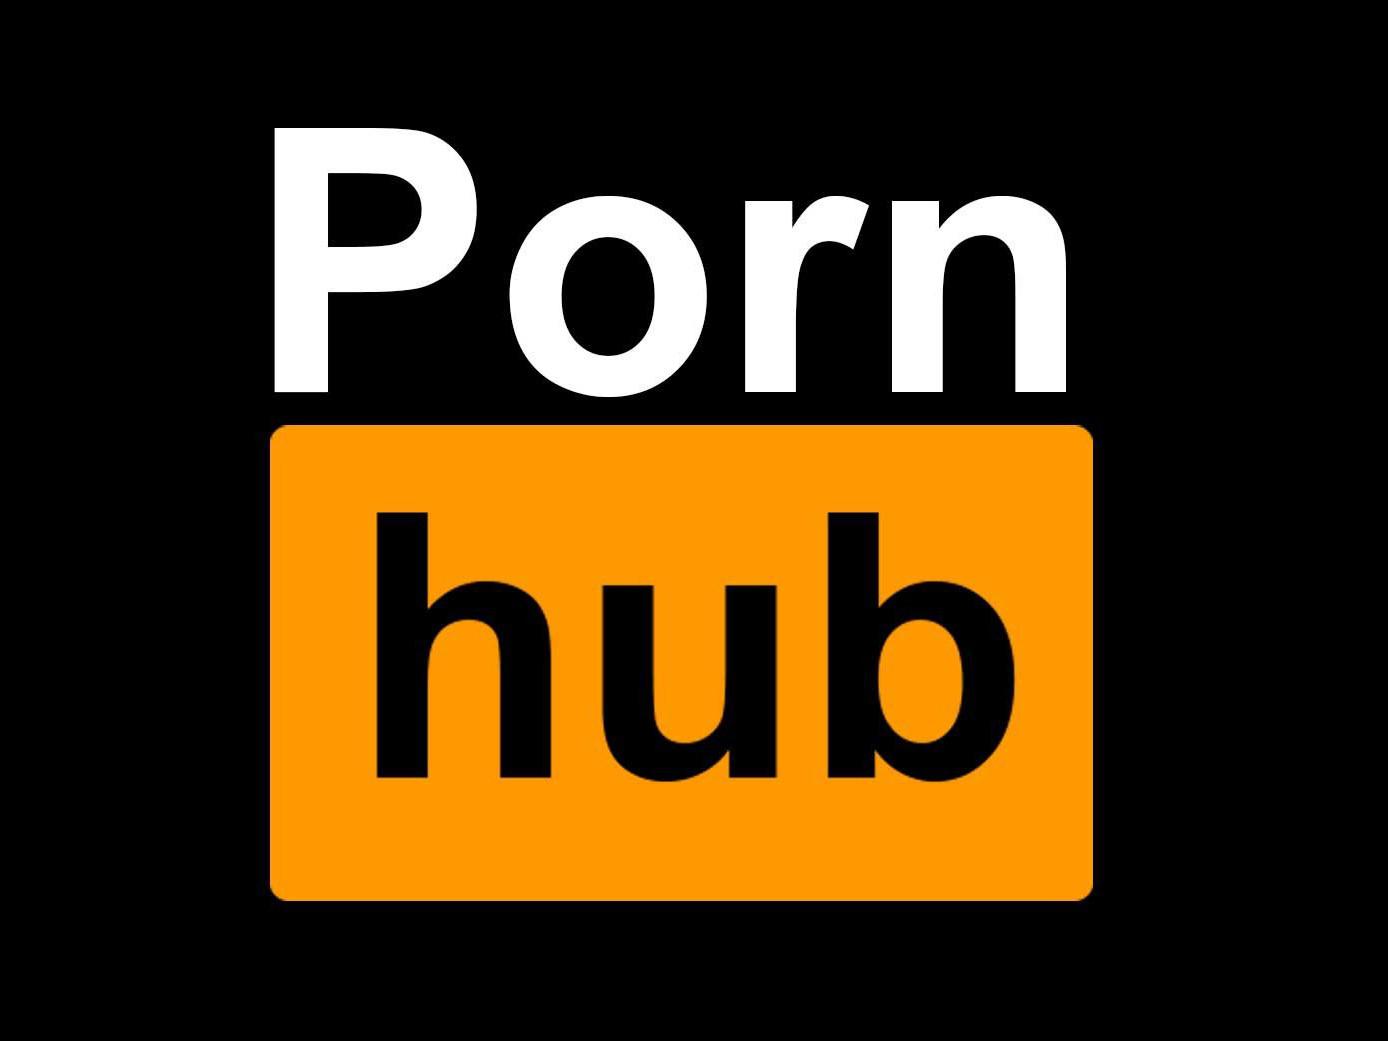 vr for pornhub